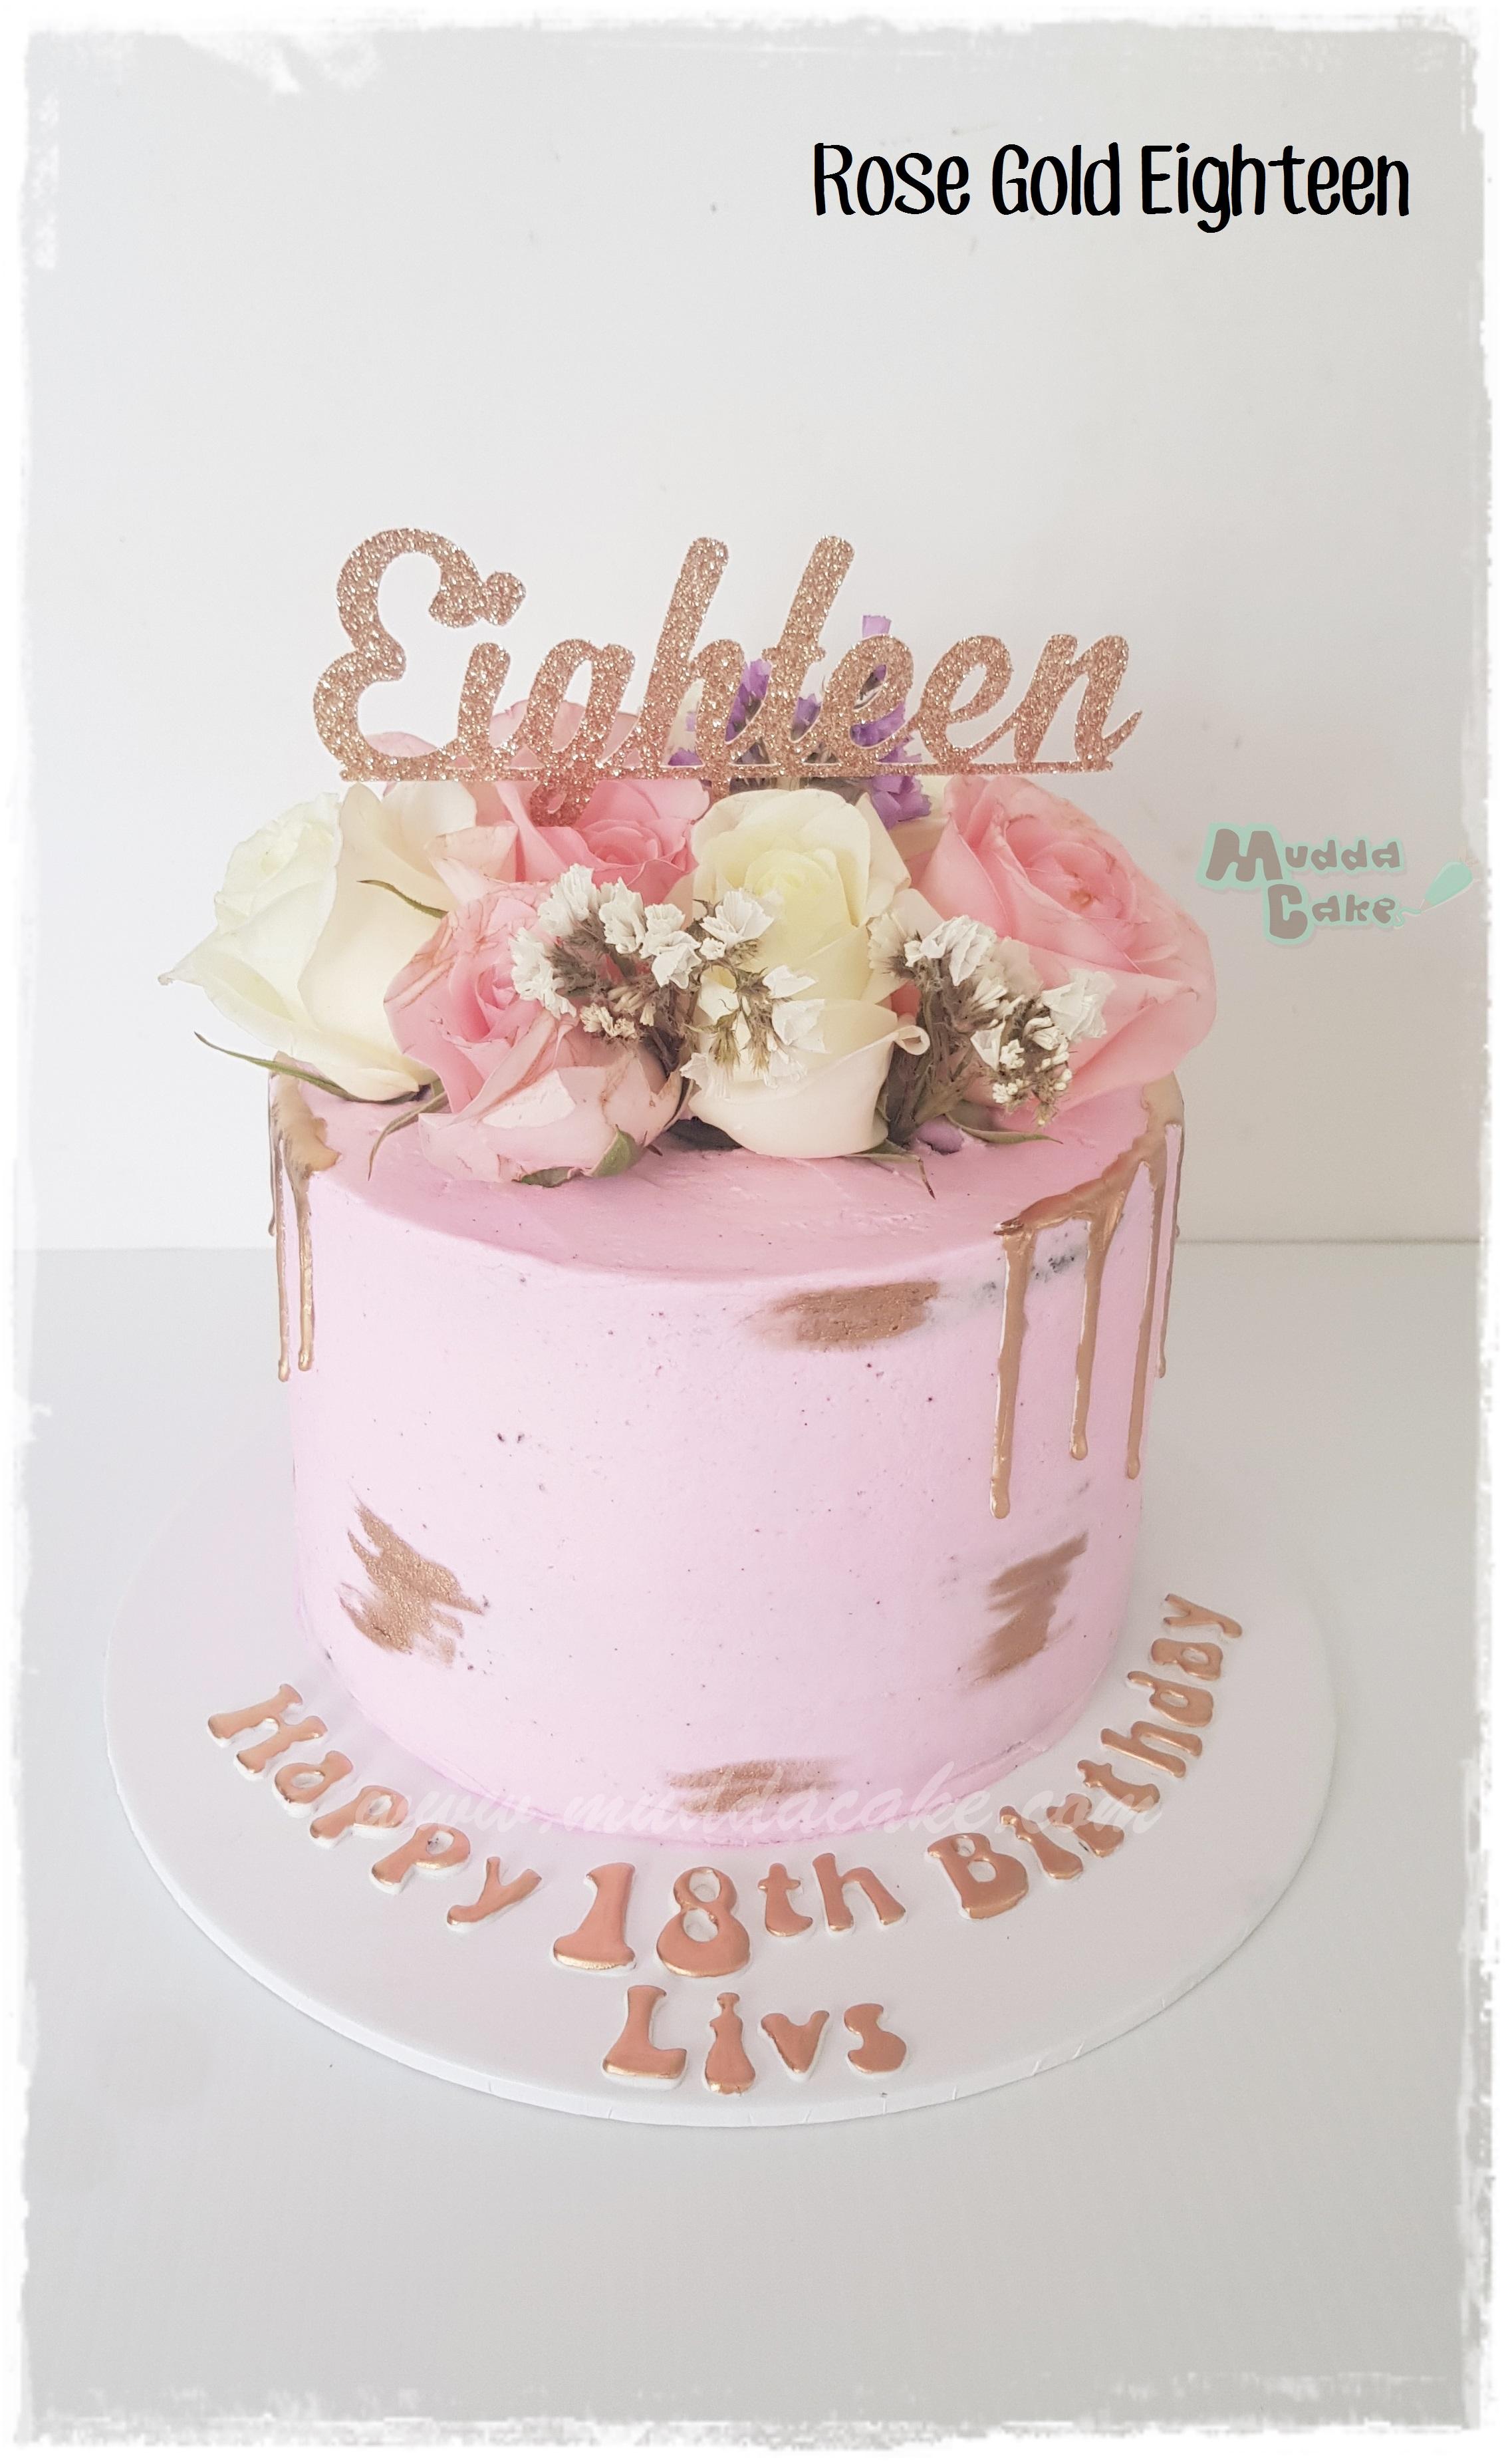 Birthday Cakes - Buff Point, Central Coast - Mudda Cake